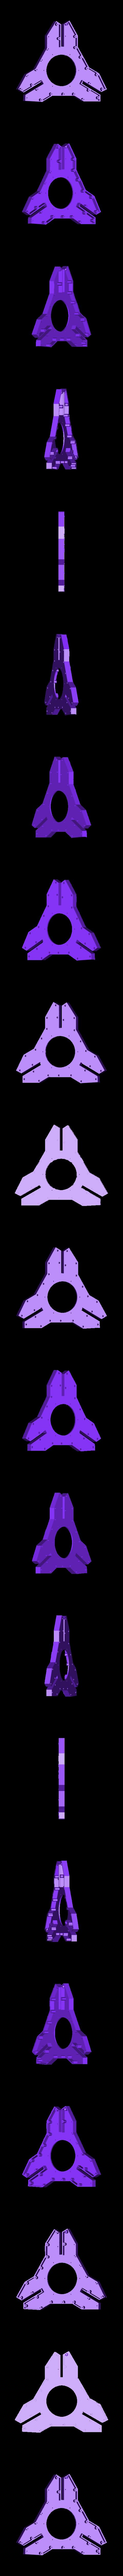 tri_btm.stl Download free STL file Guardian Shield+ Zelda Breath of the Wild • 3D print object, Adafruit